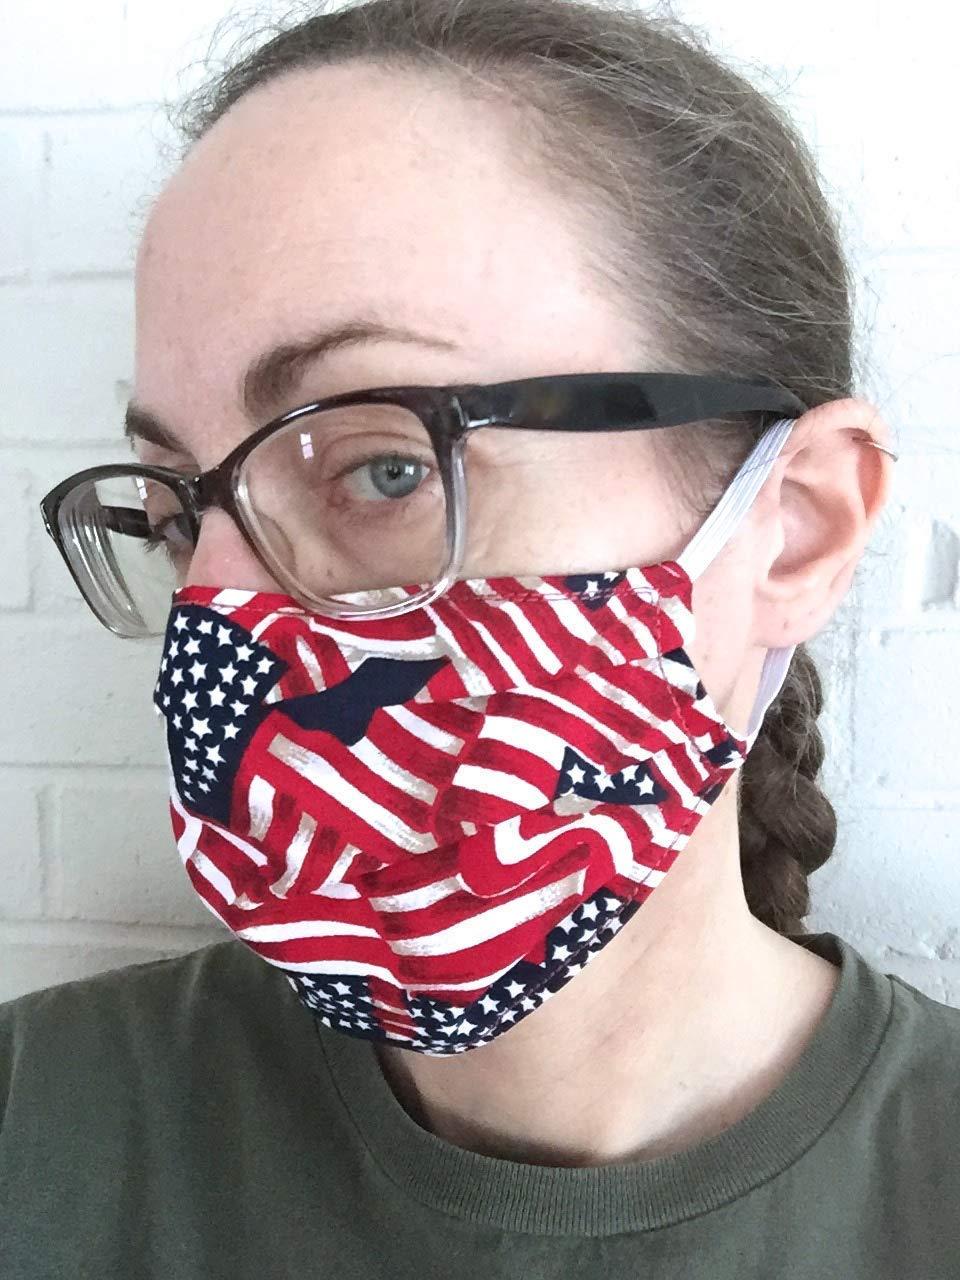 60 América Patriótico Apliques de tela de flores de 4 De Julio//US FLAG//estrella//Rojo//Azul Marino H242